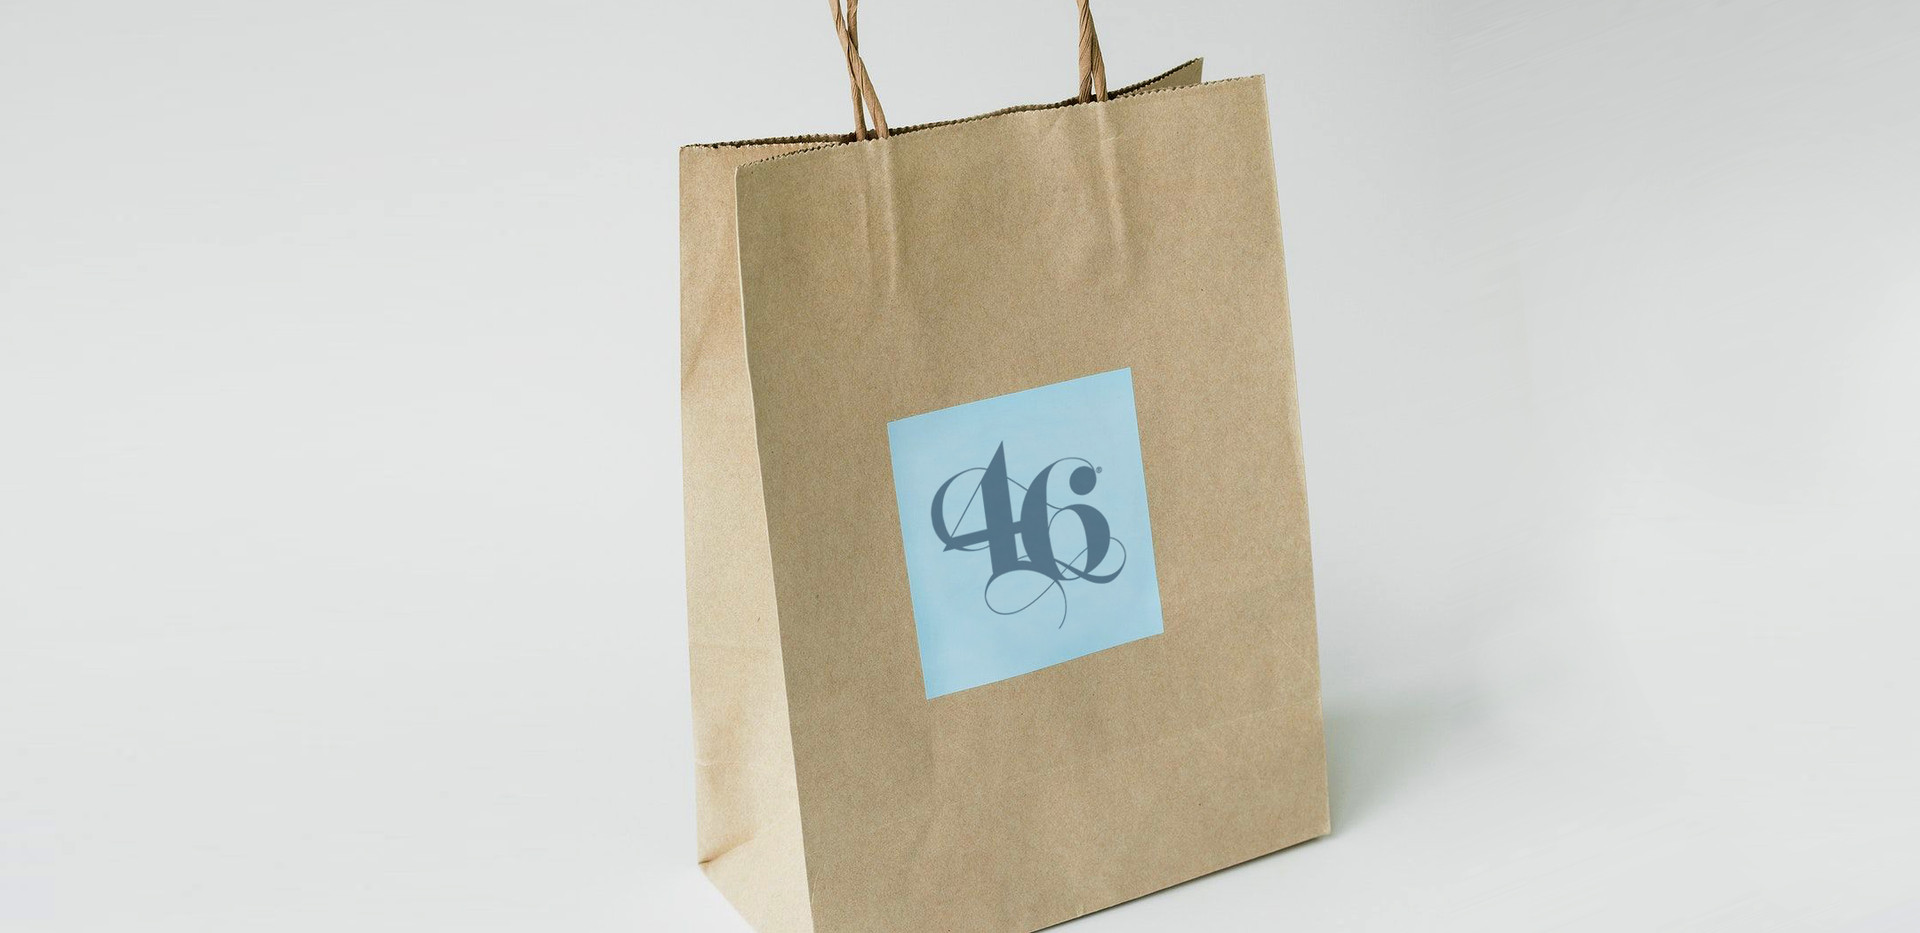 46 Calligraphy Shopping Bag